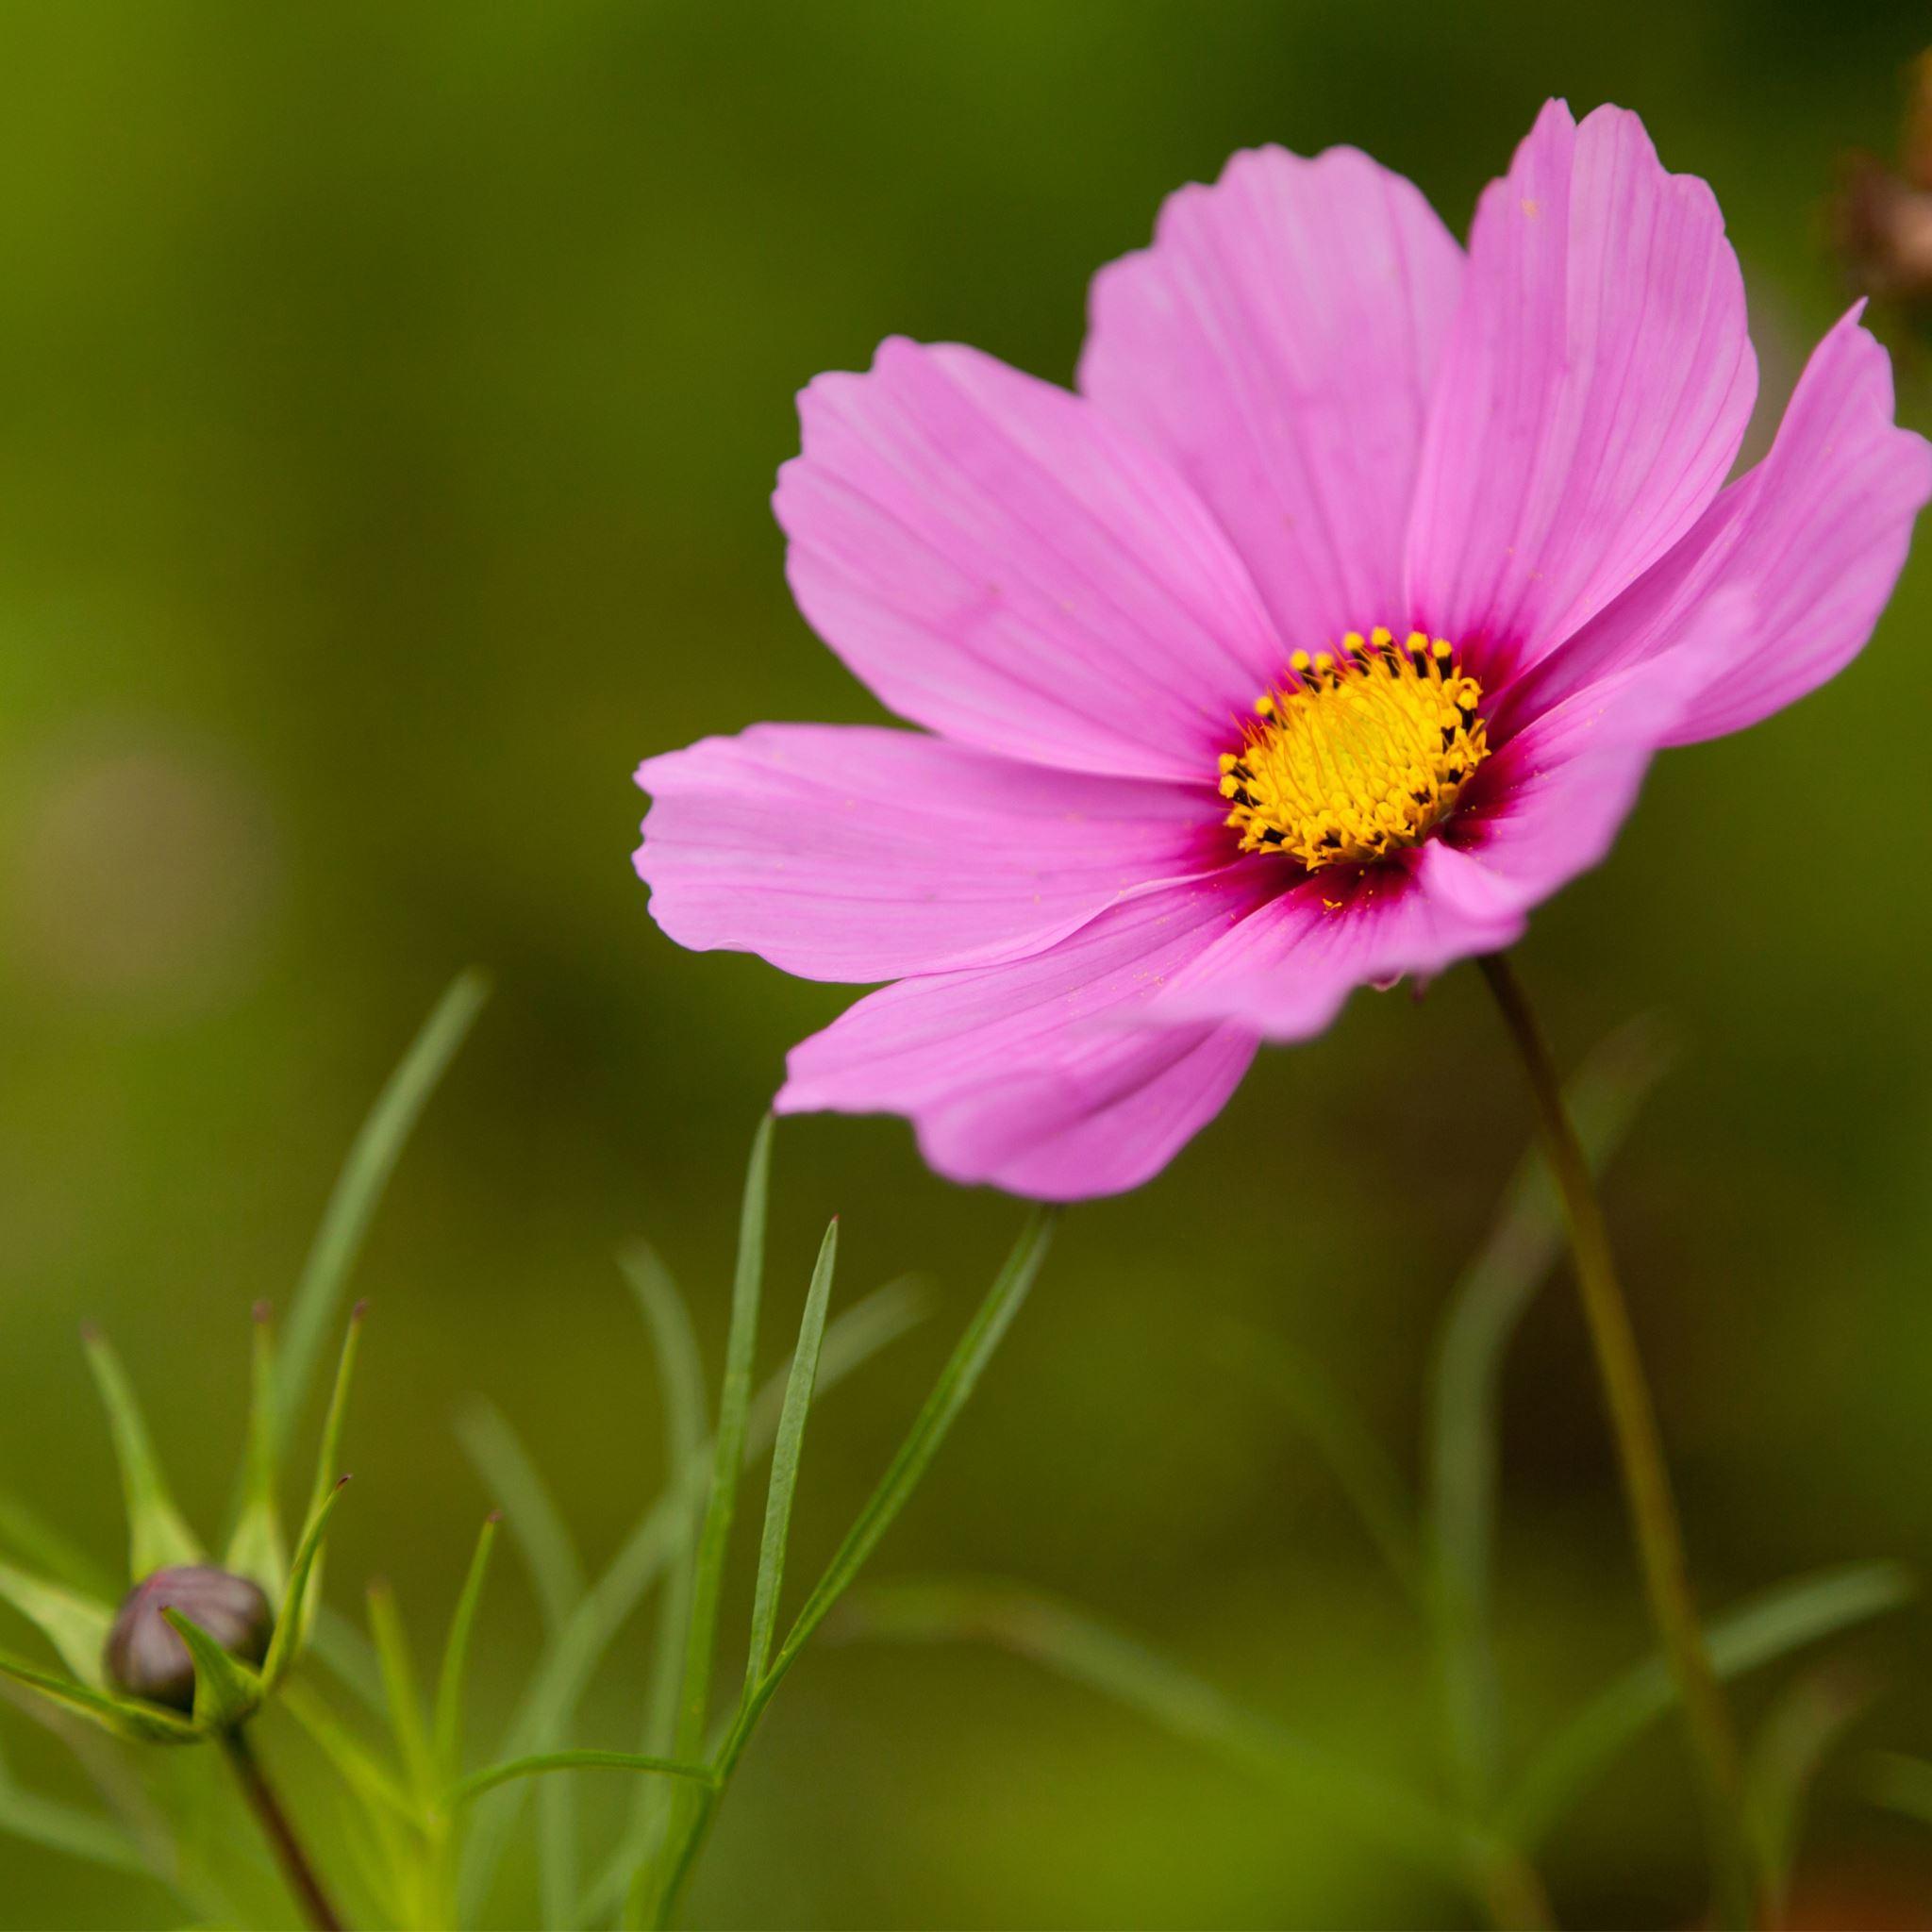 Pink cosmos flower ipad air wallpaper download iphone wallpapers pink cosmos flower ipad air wallpaper mightylinksfo